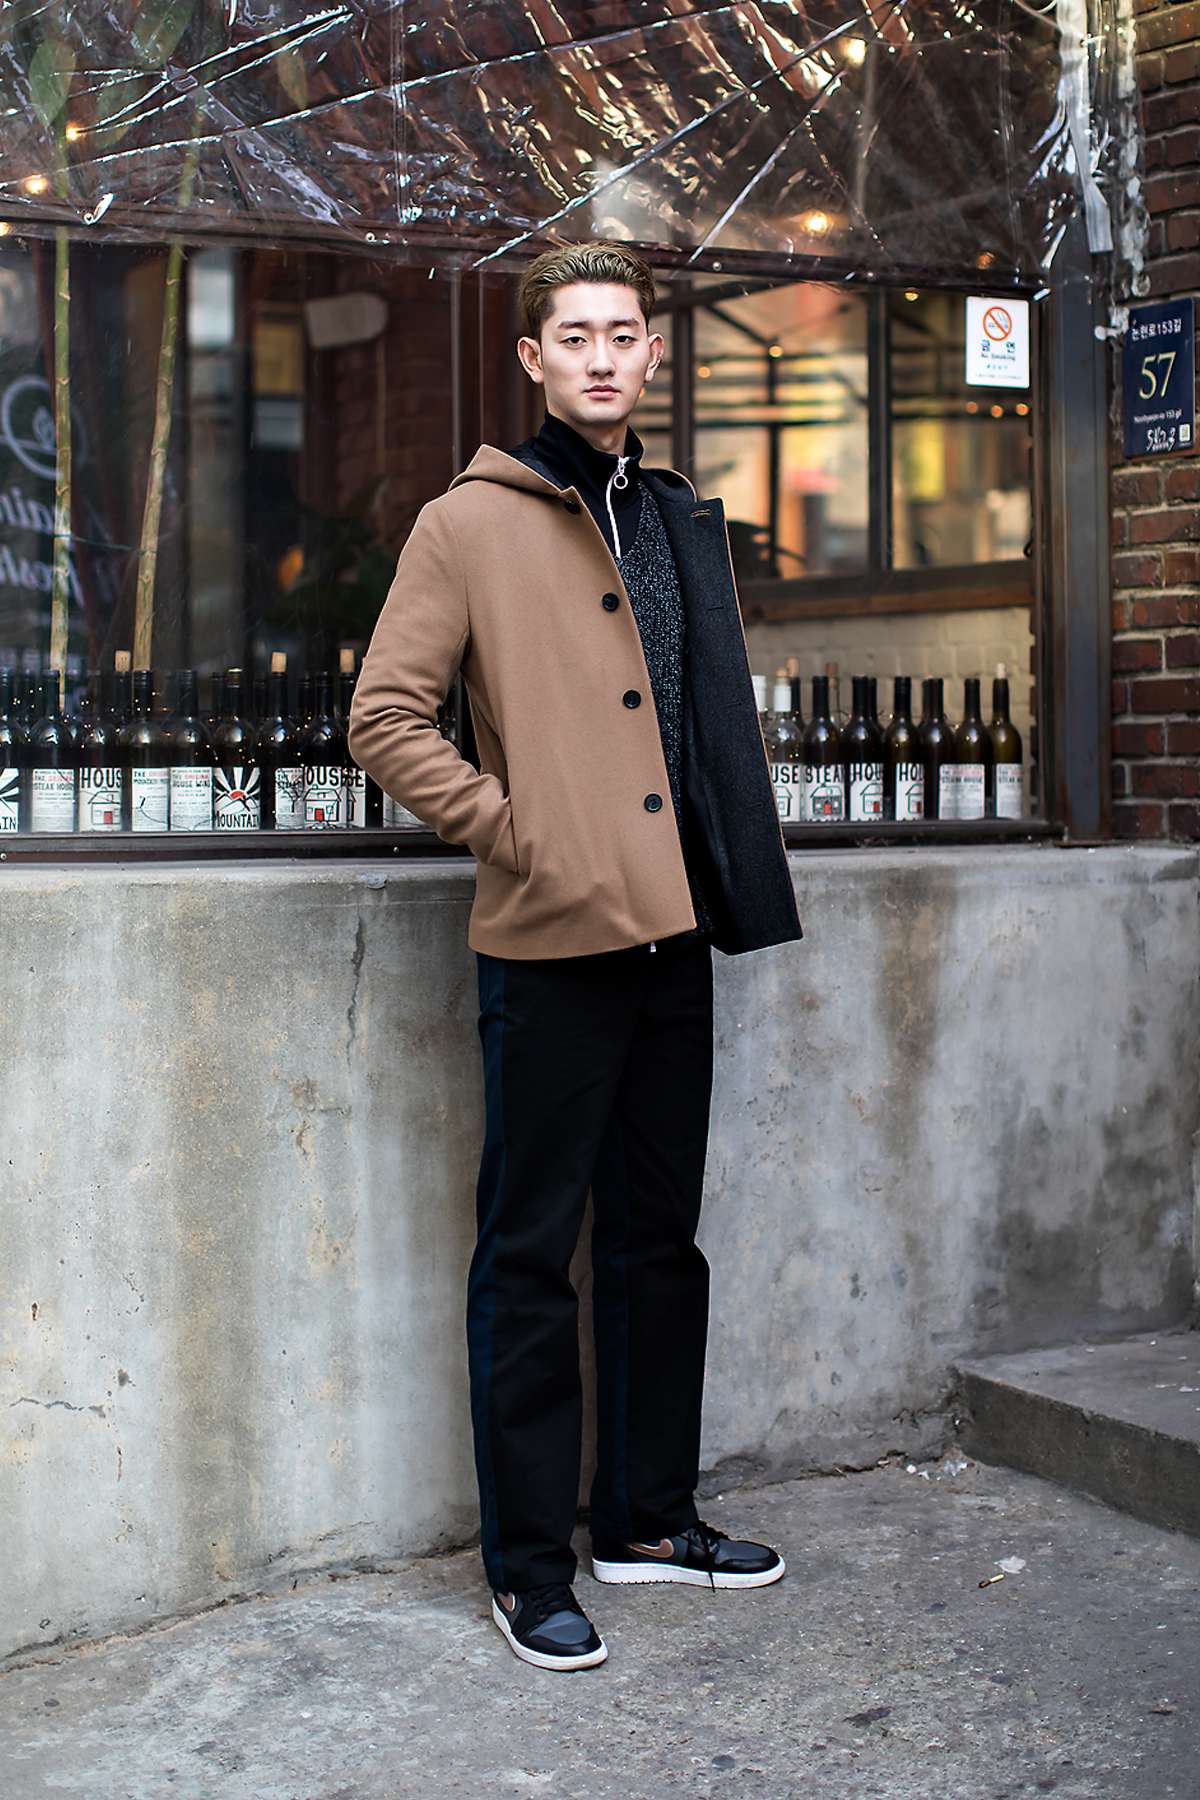 Oh Kyusik, Street Fashion 2017 in SEOUL.jpg